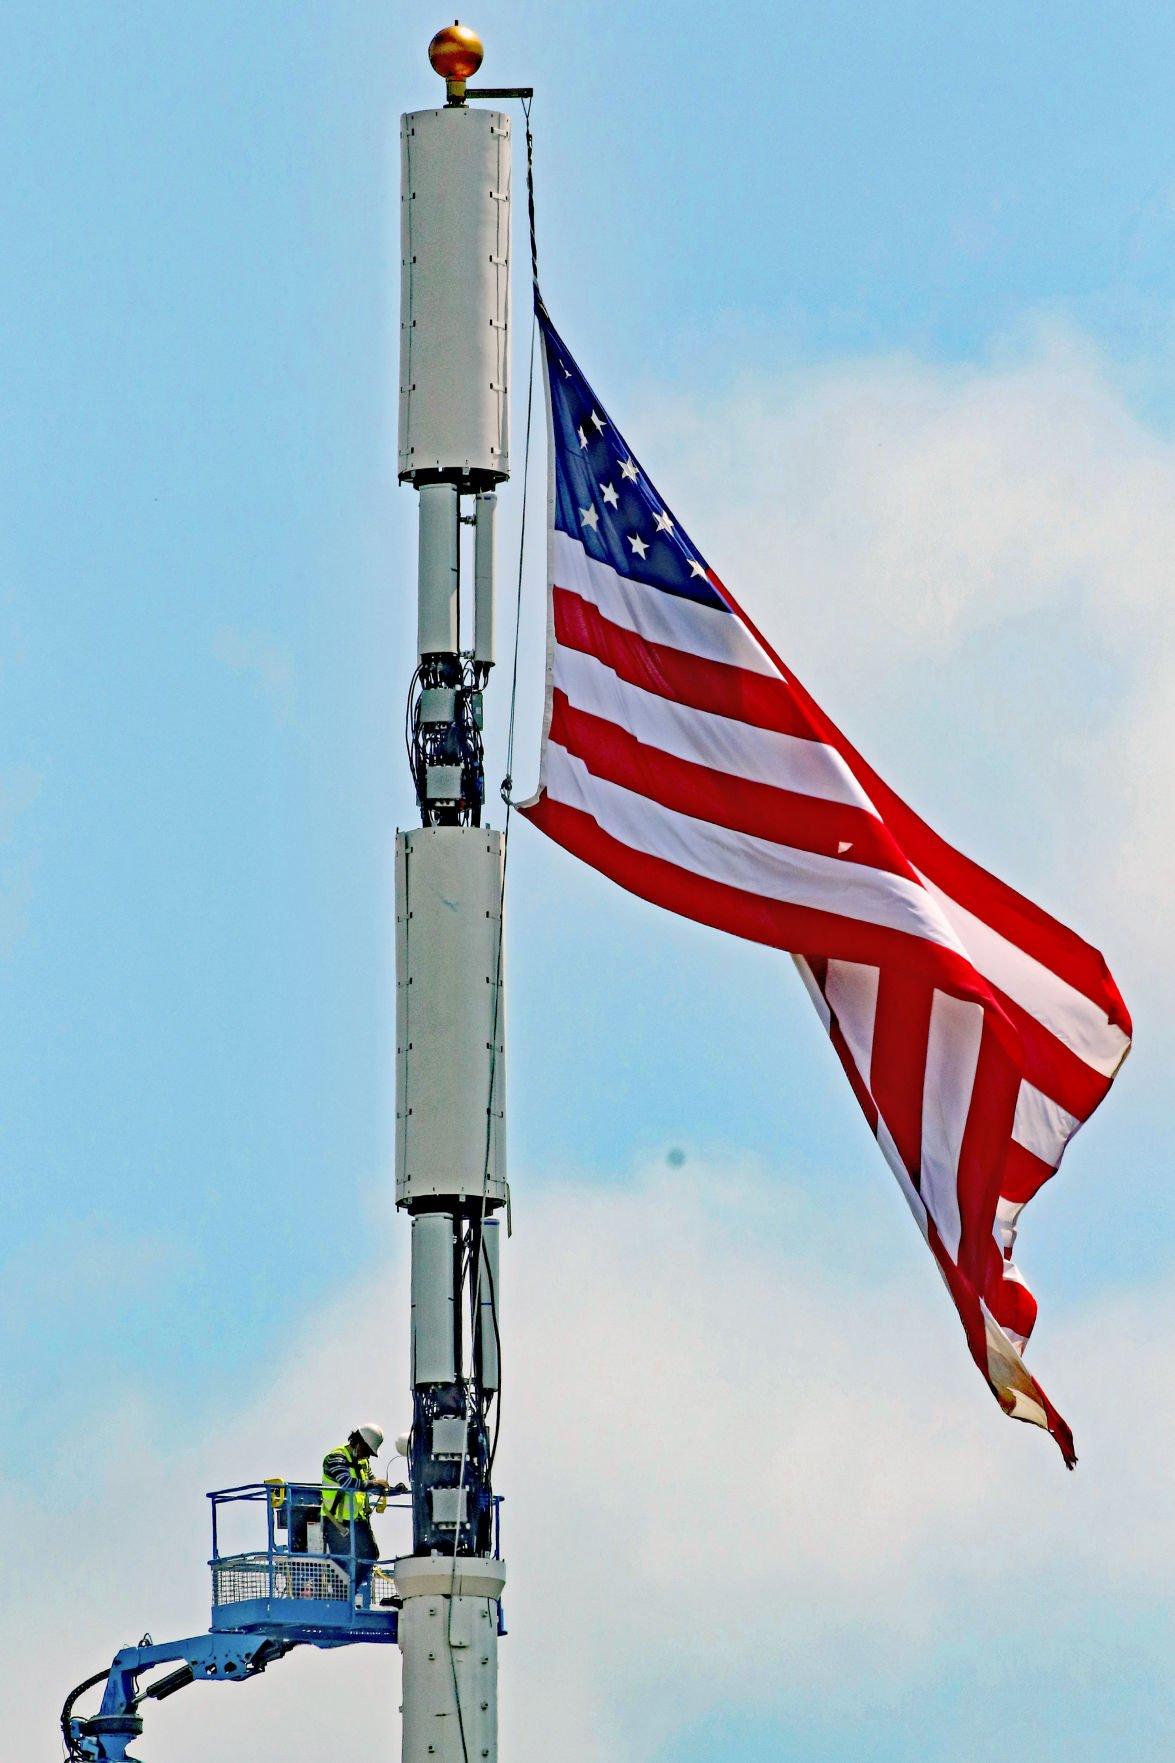 MYS Cell tower flagpole work 24545.JPG